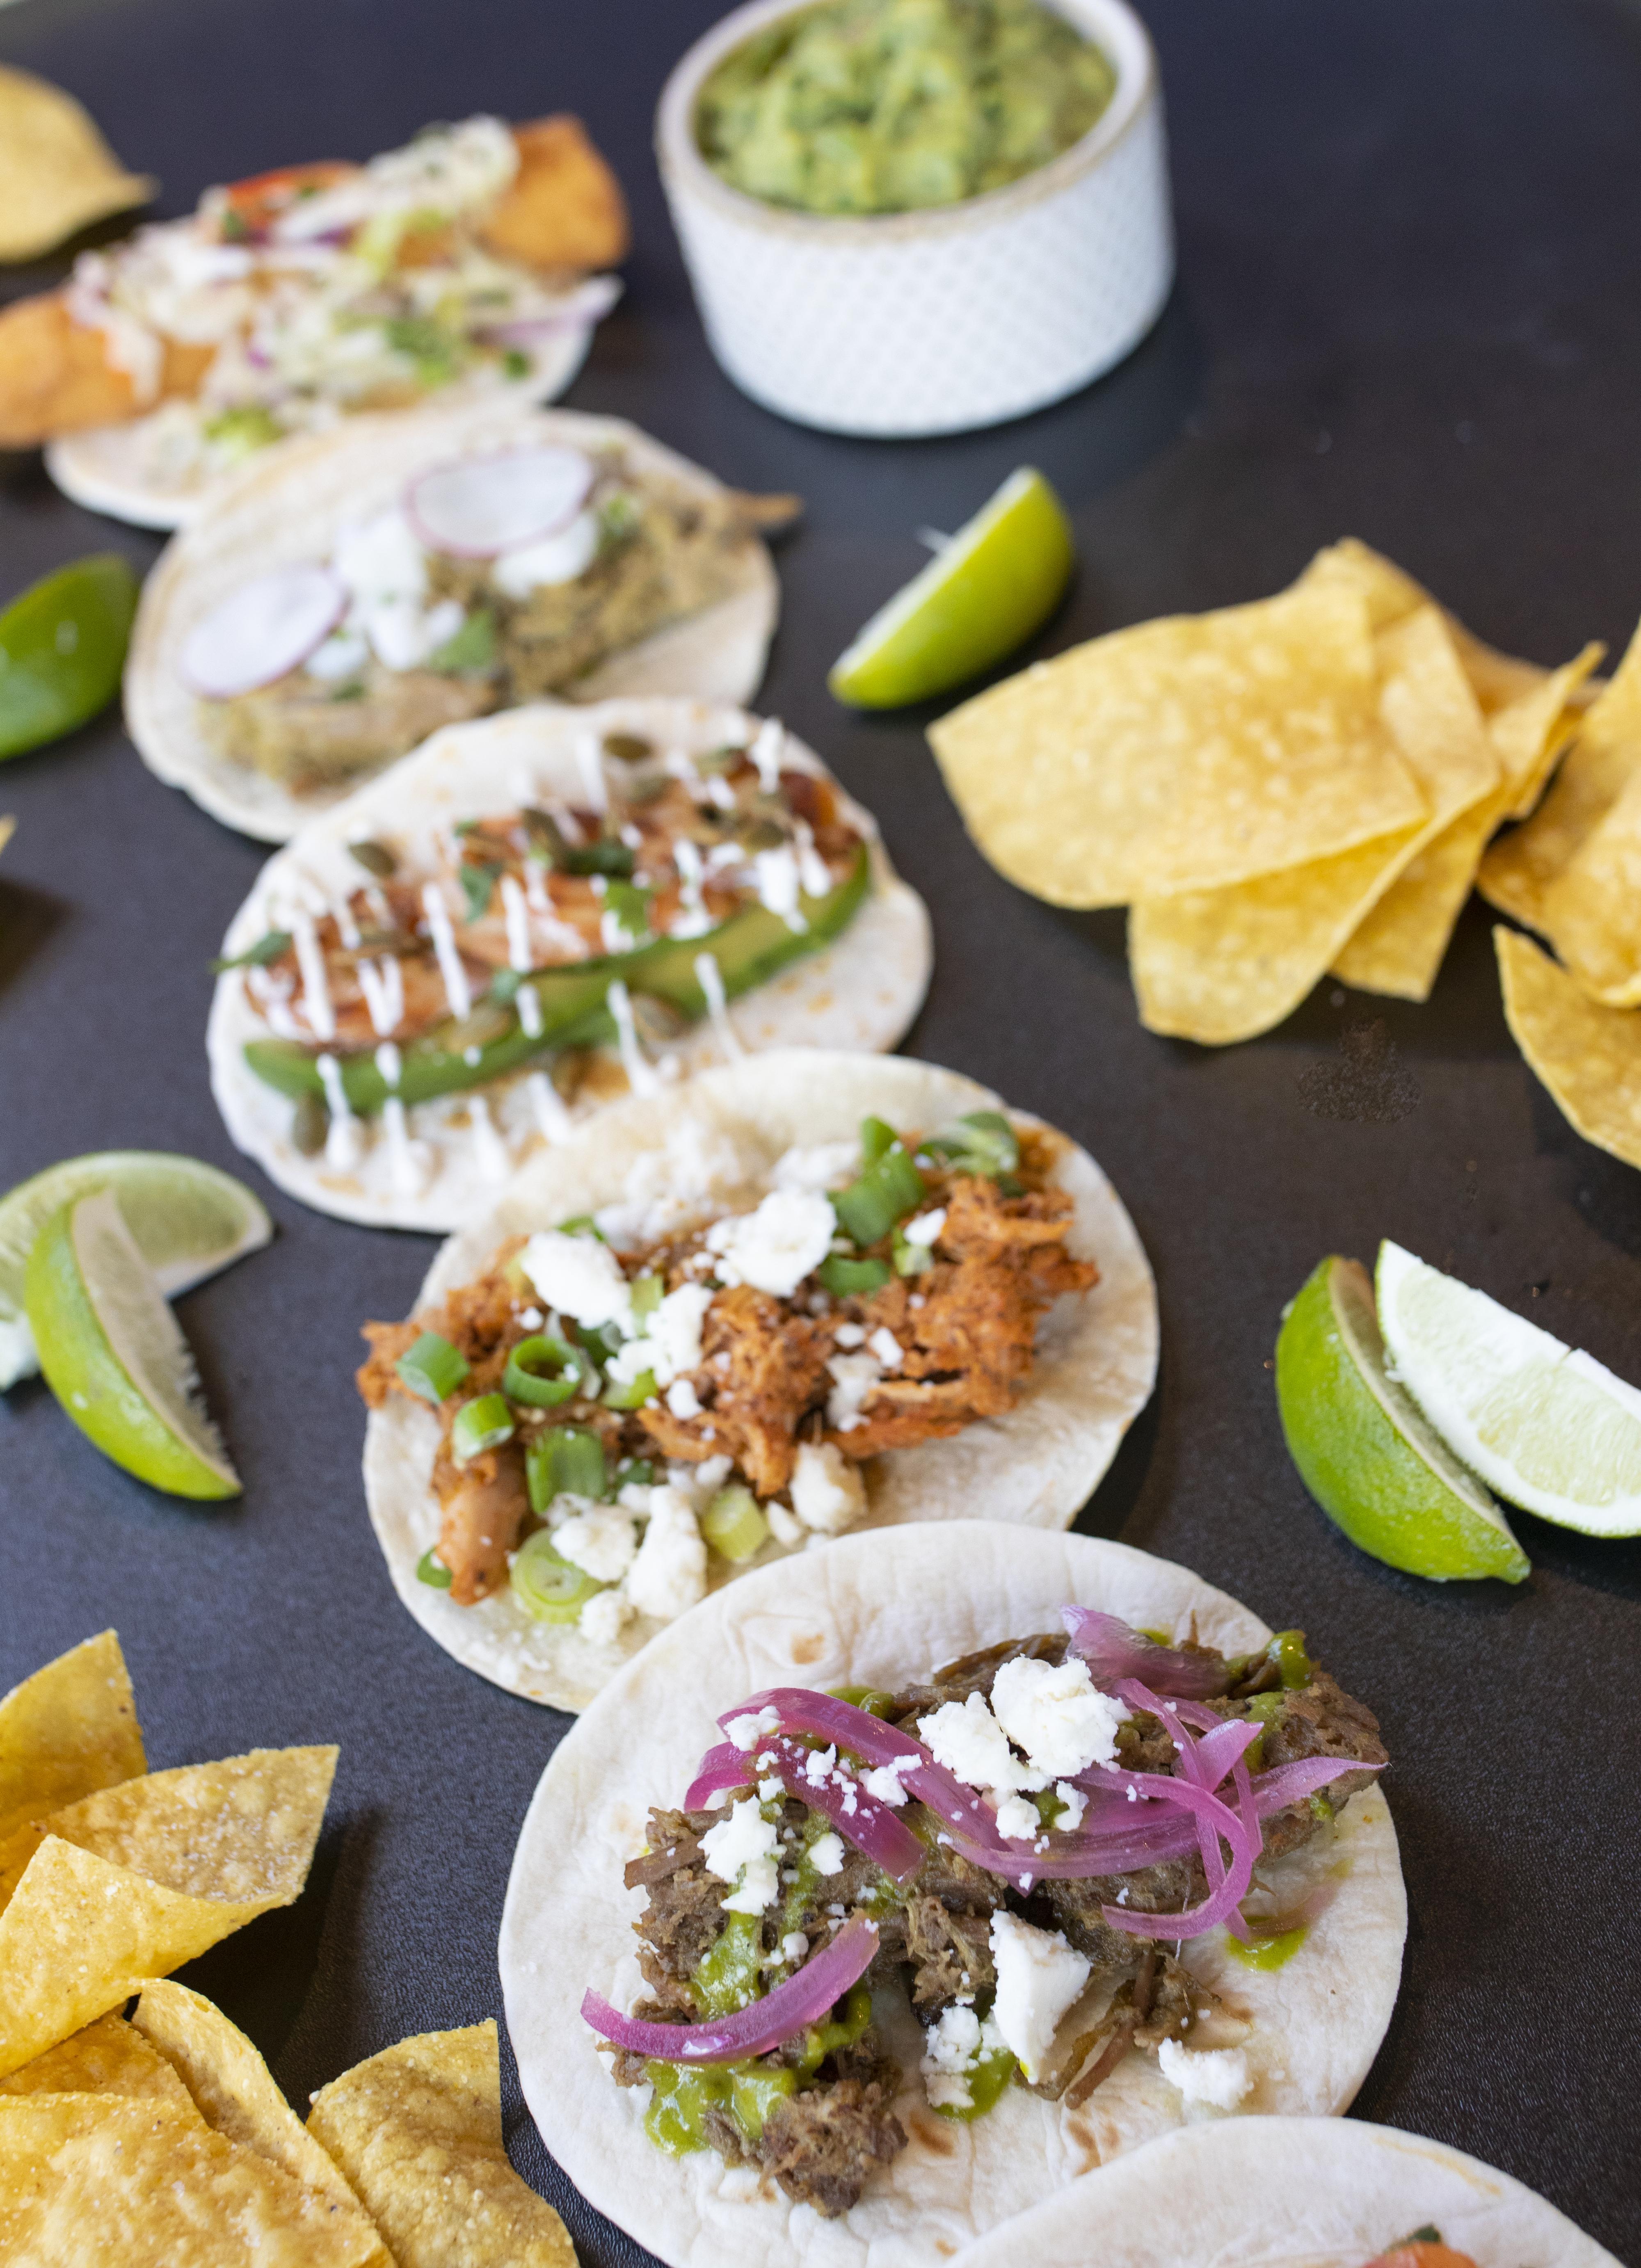 Street Taco Taqueria Opens at Marietta Square Market Food Hall